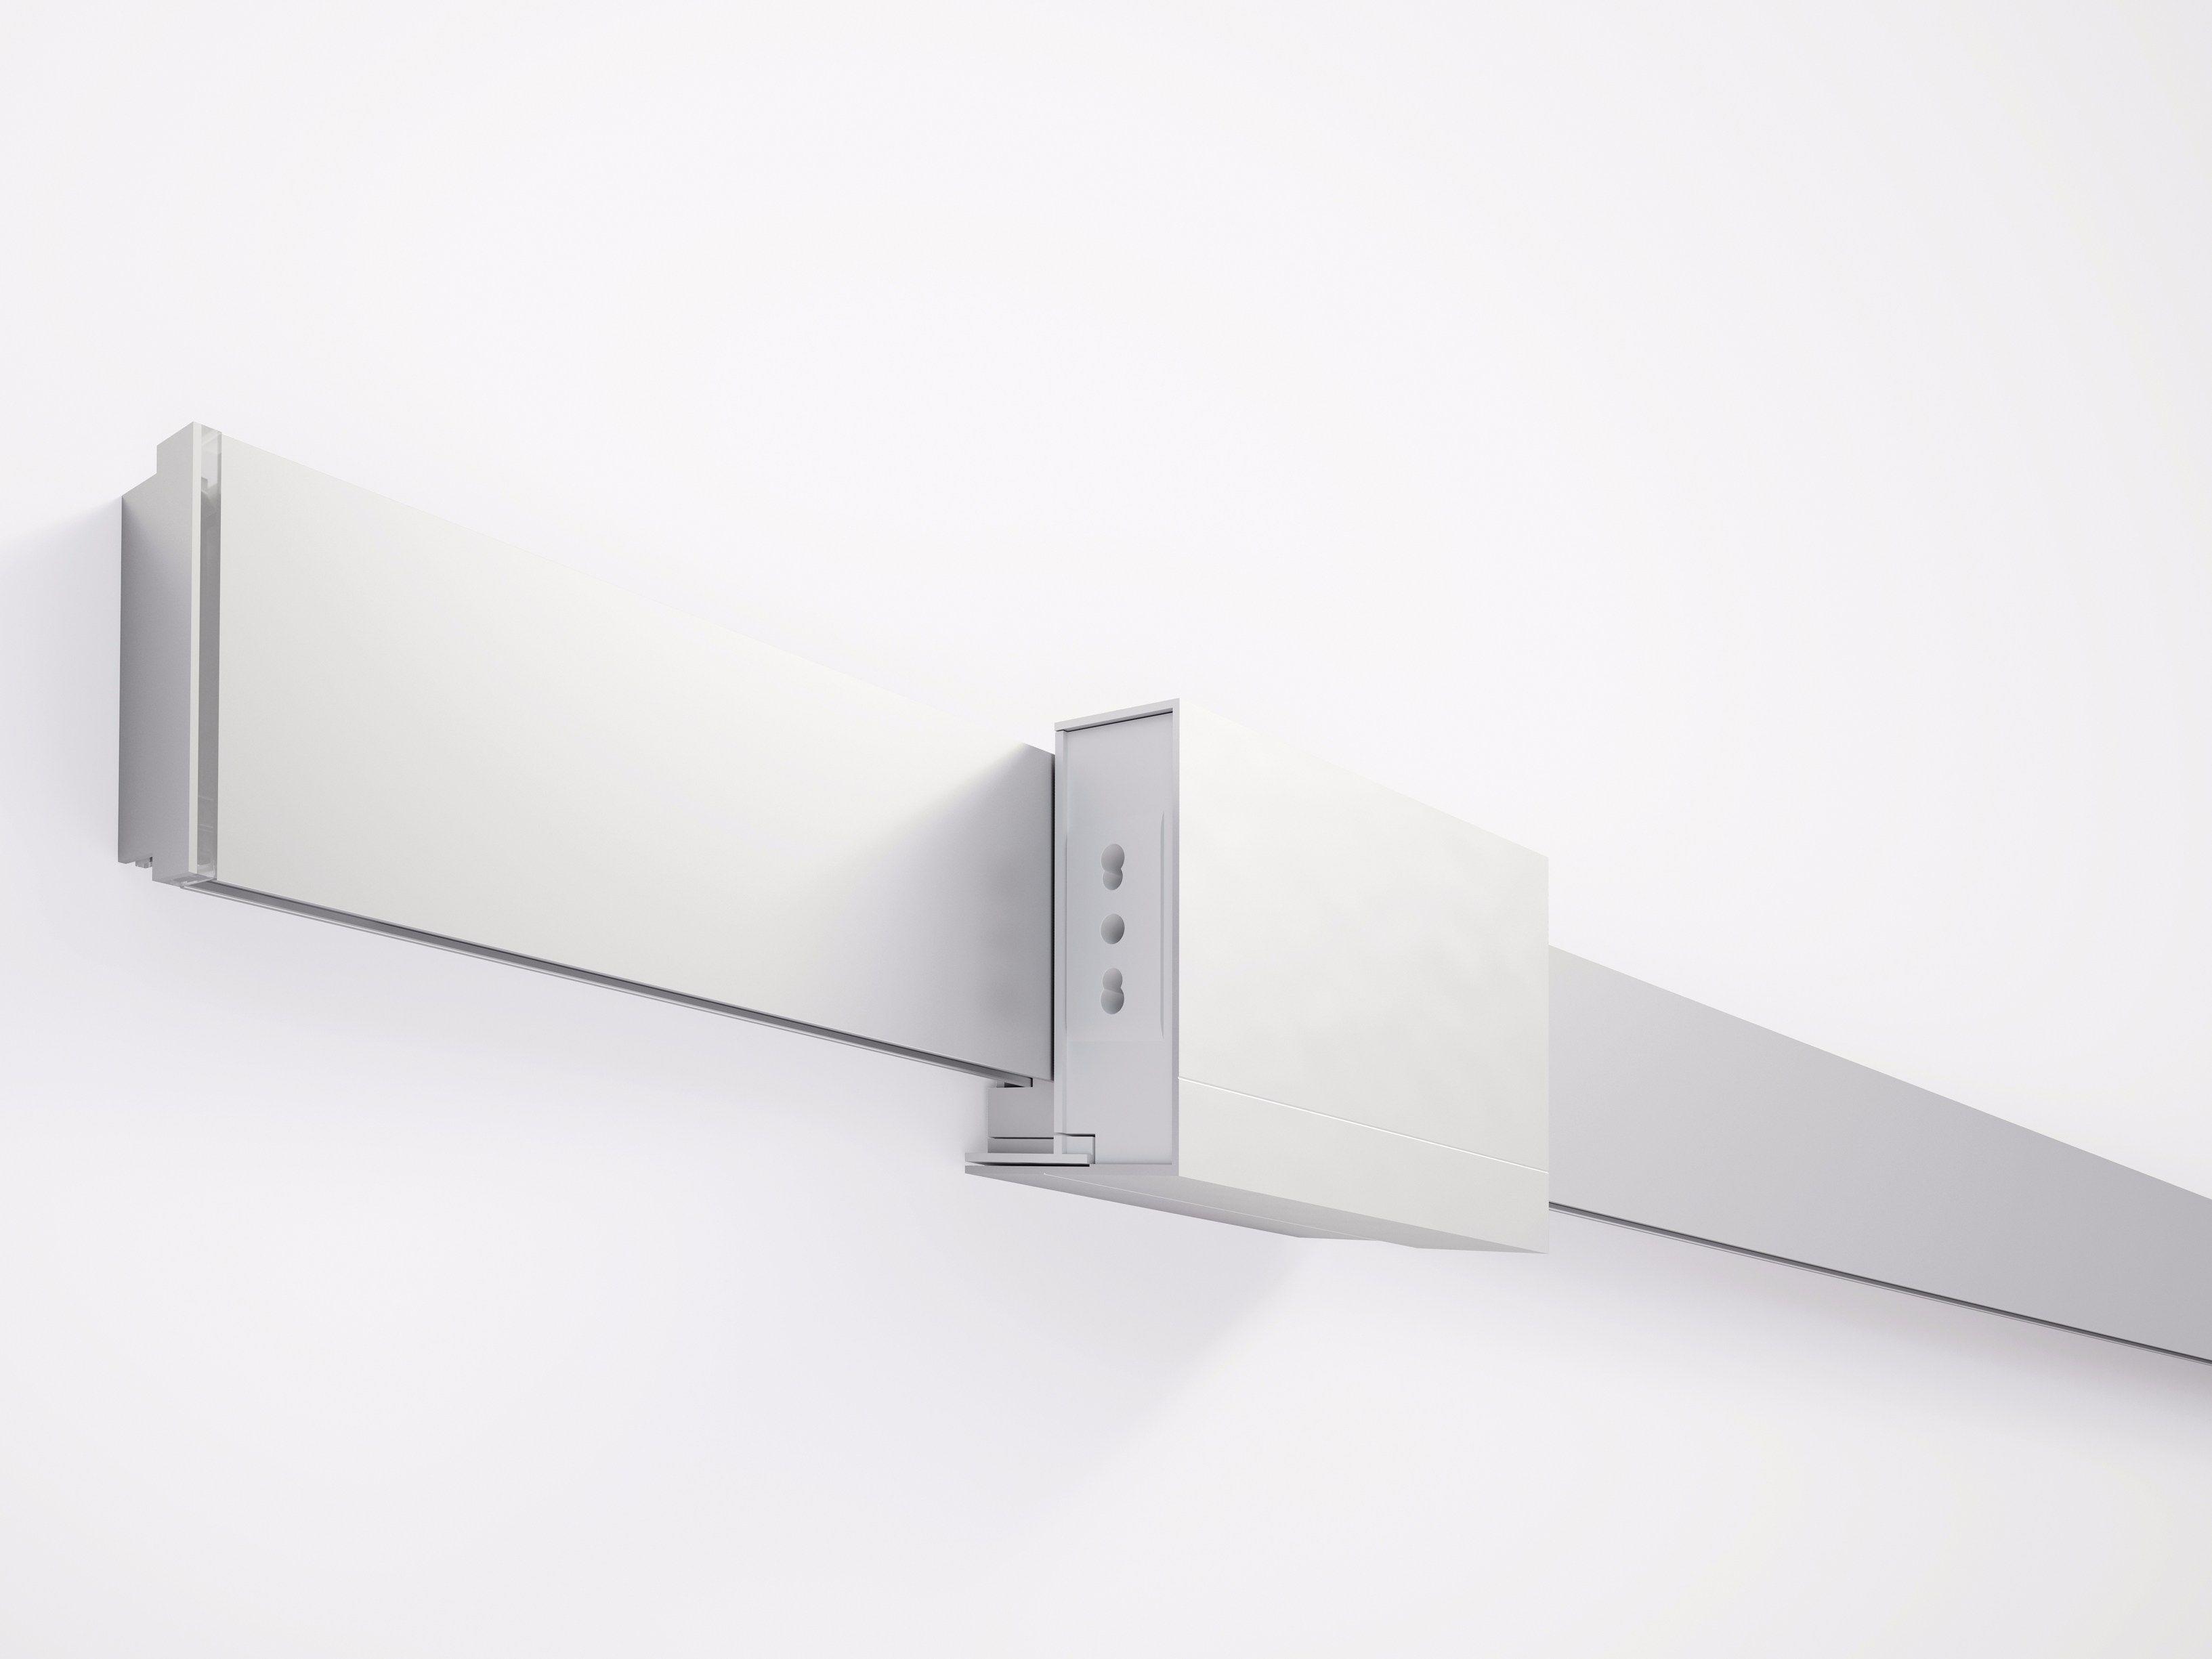 Nodo box electrical electrical outlets design e usb